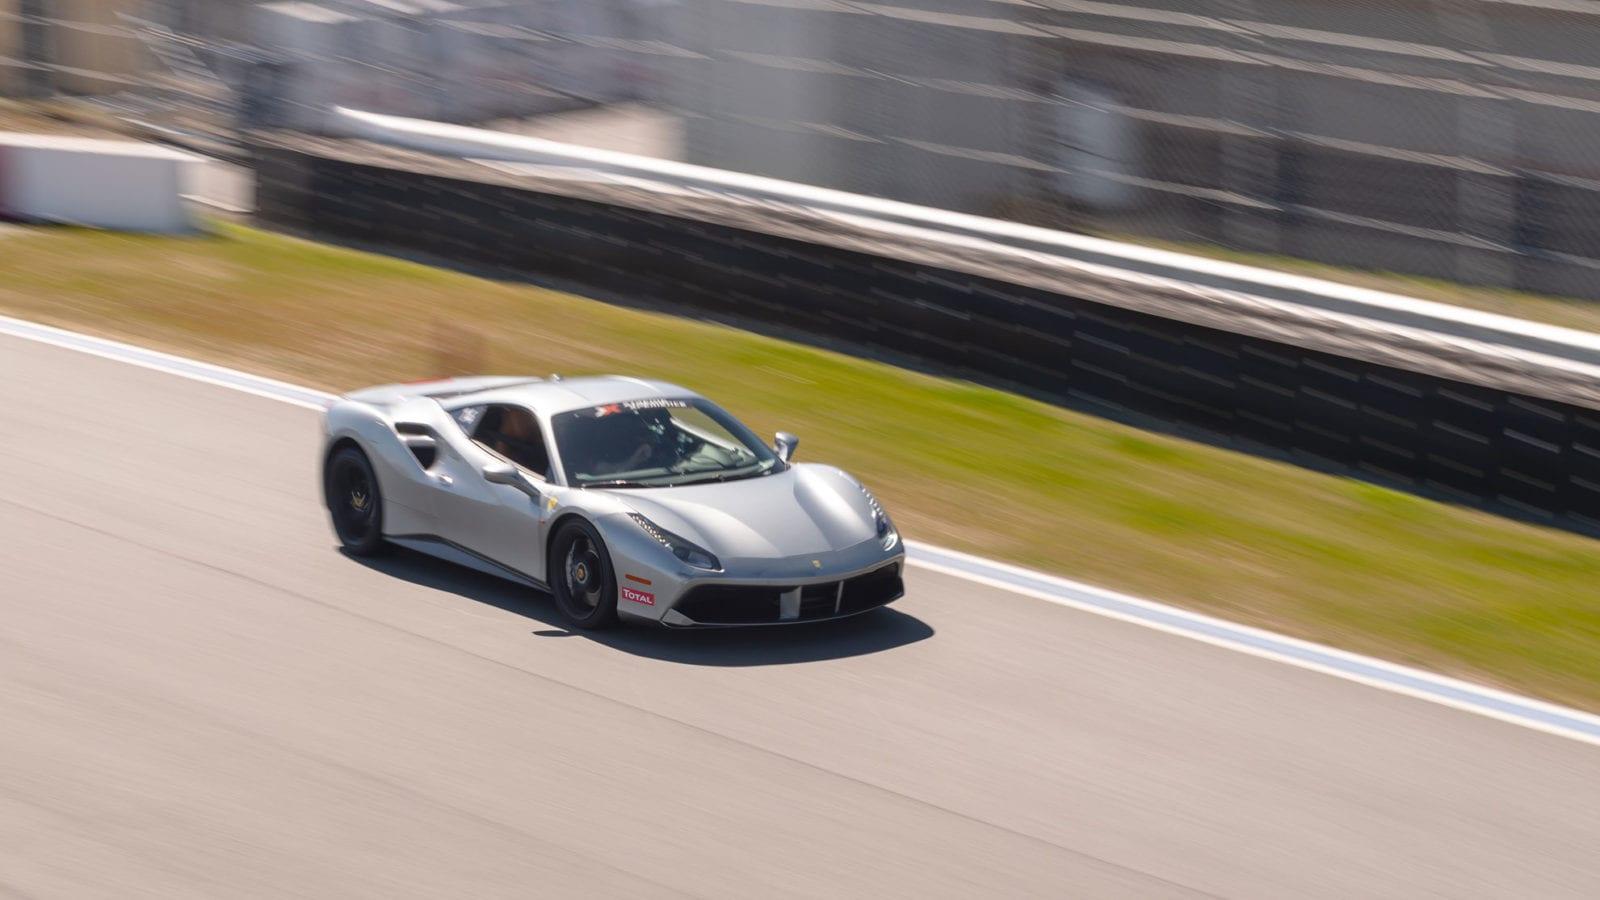 Ferrari 488 GTB in silver on the racetrack